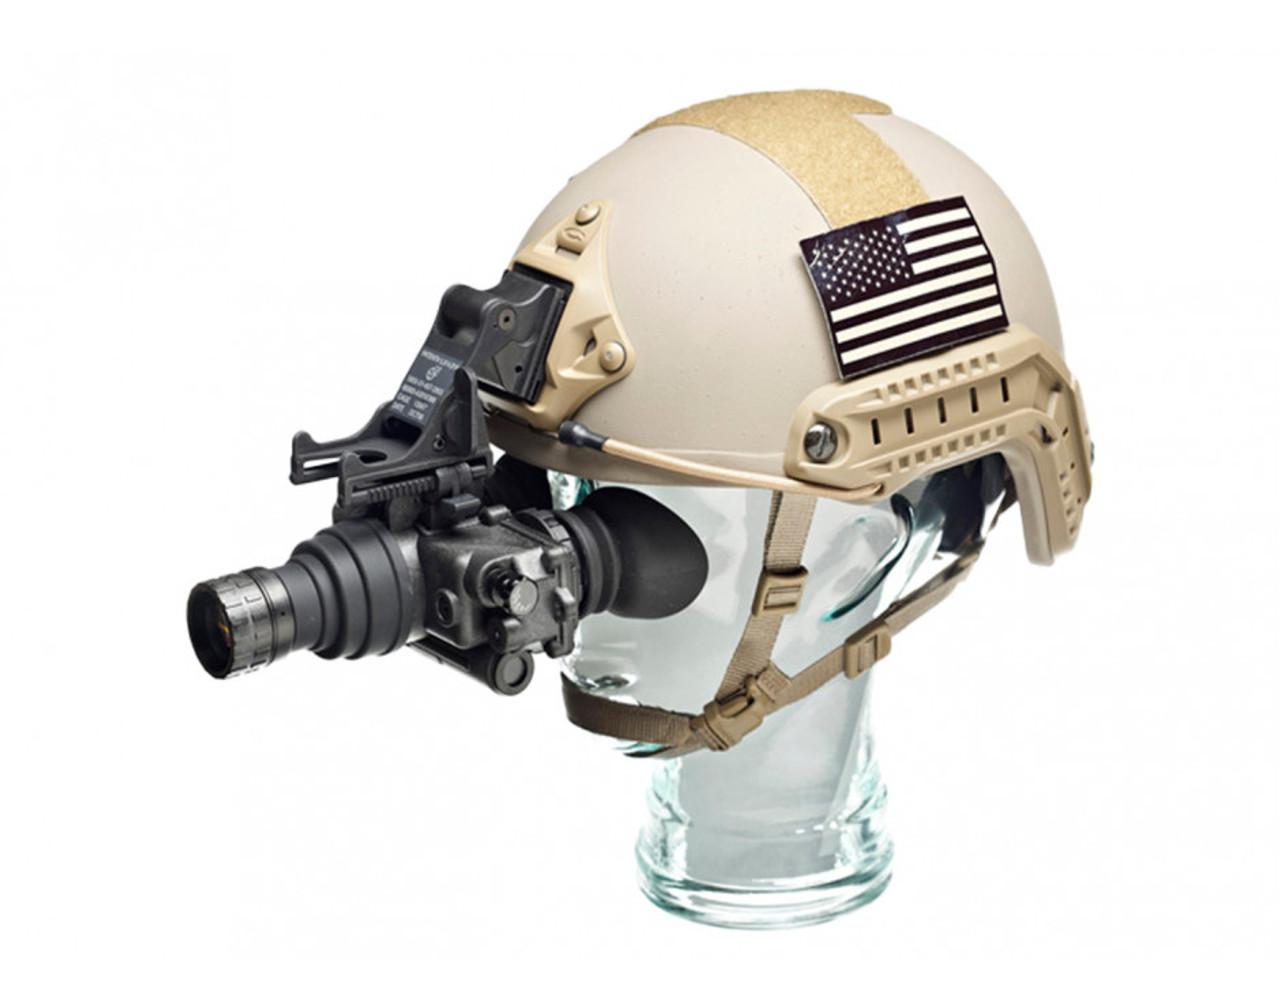 "AGM PVS-7 3NL1 Night Vision Goggle Gen 3 ""Level 1"". Made in USA (AGM PVS-7 3NL1)"